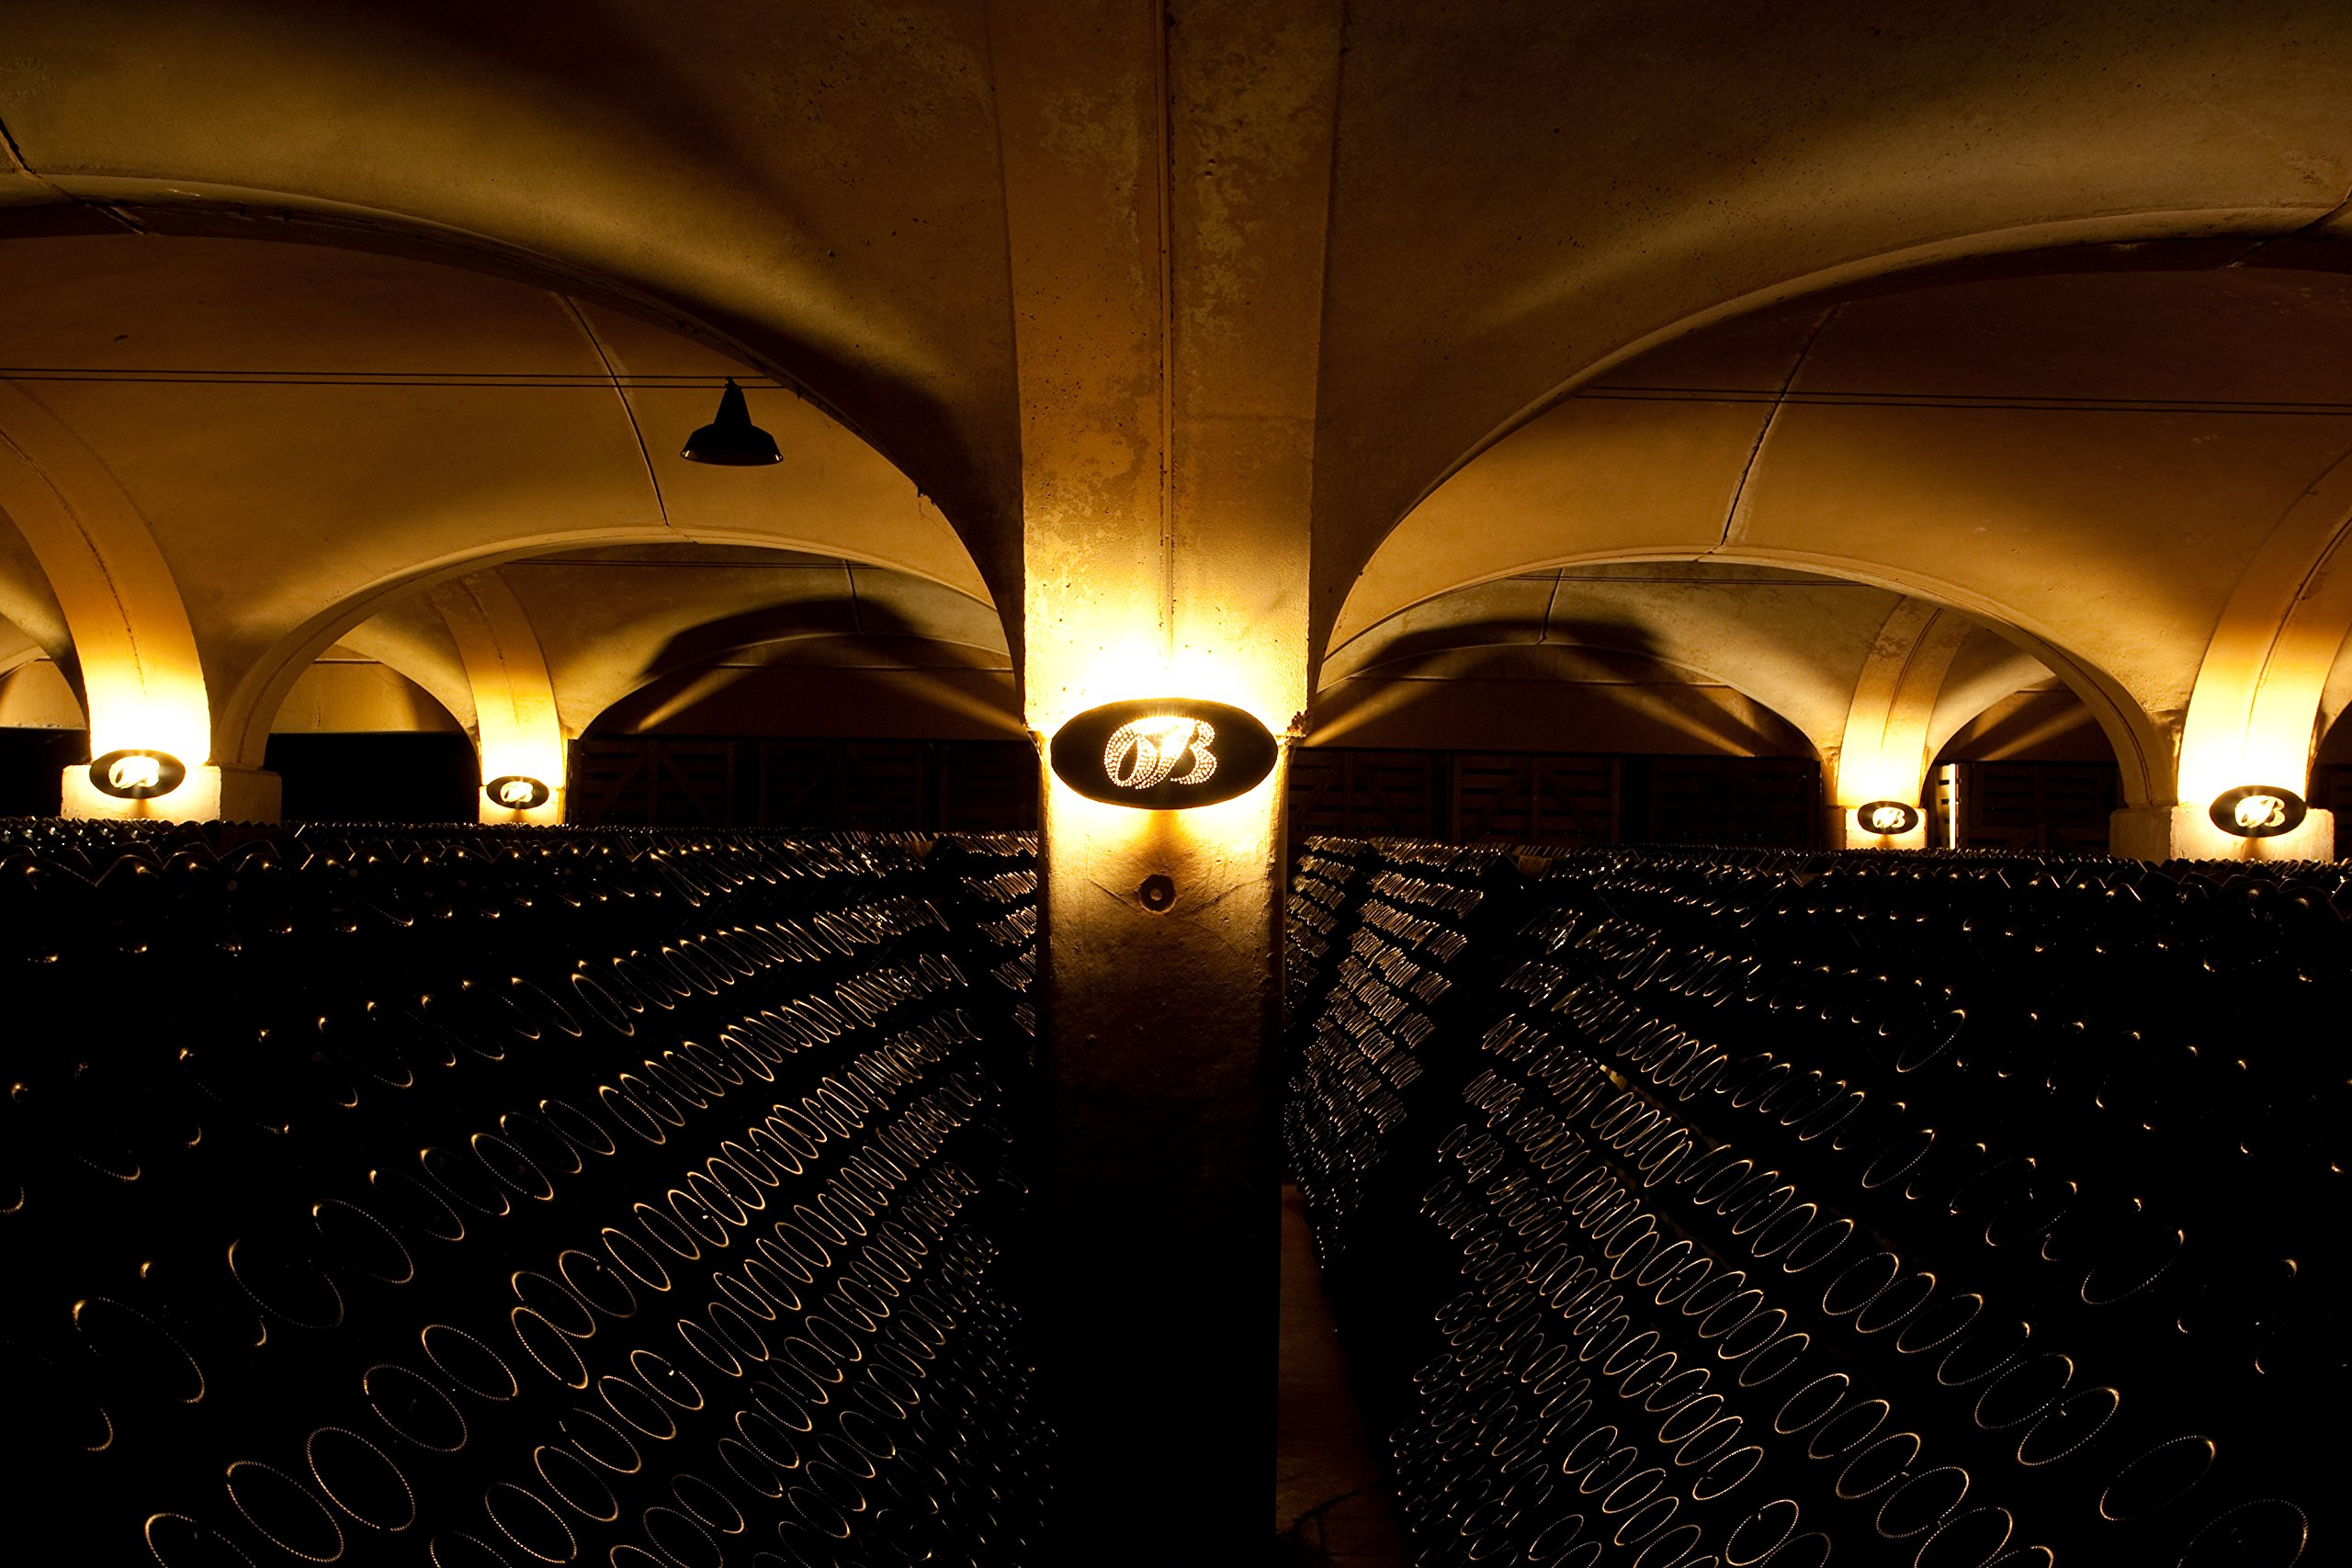 Bellavista-Sekt-Cava-Cremant-aus-Italien-Bellavista-Alma-Cuve-Brut-Franciacorta-1-x0375-Liter